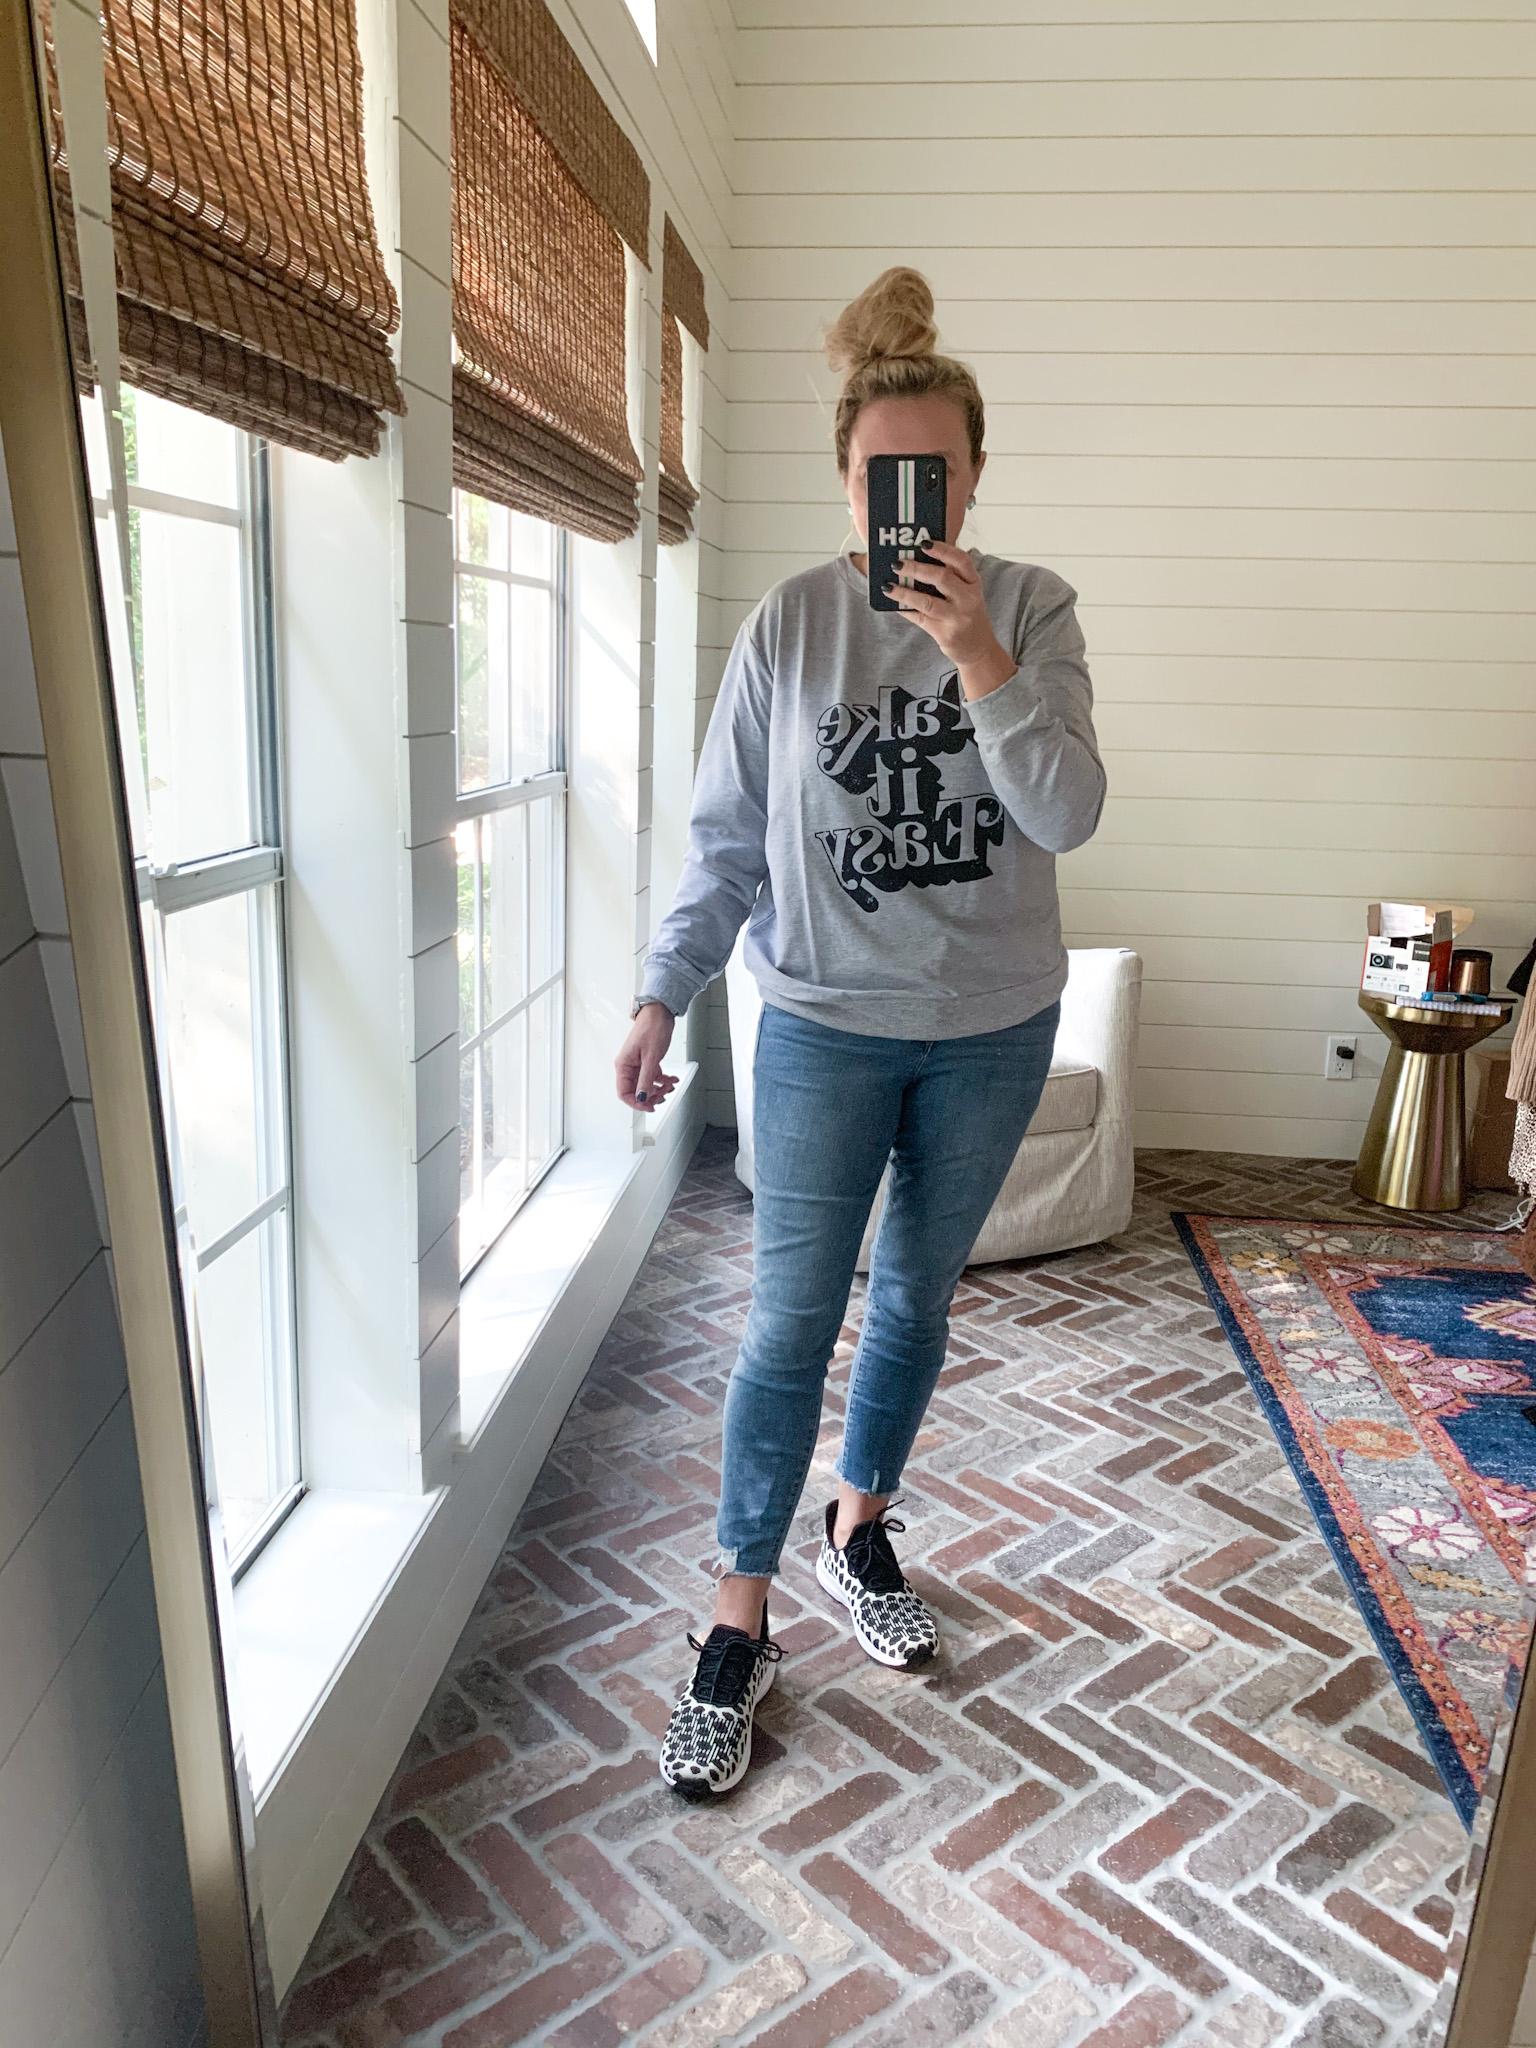 Amazon Haul by popular Houston fashion blog, Fancy Ashley: image of a woman wearing a Amazon SUUKSESS Women Sweatshirt, Walmart Sofia Jeans Rosa Curvy Ripped Hem High Waist Ankle Jean, and Walmart Women's Athletic Works Soft Running Sneaker.